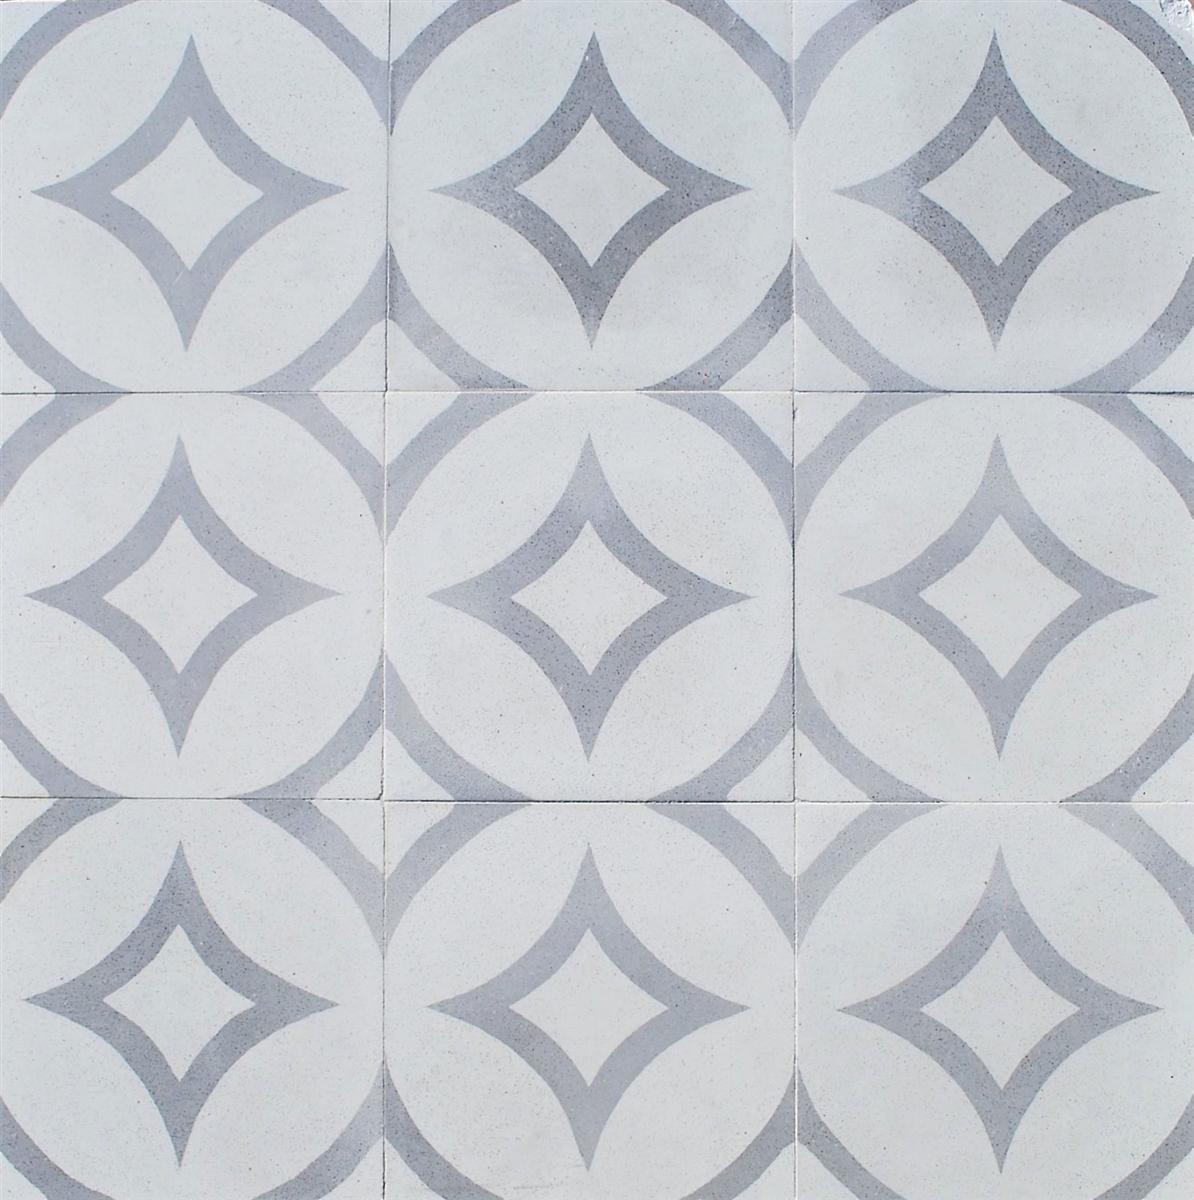 luna gray geo 8x8 encaustic cement floor tile